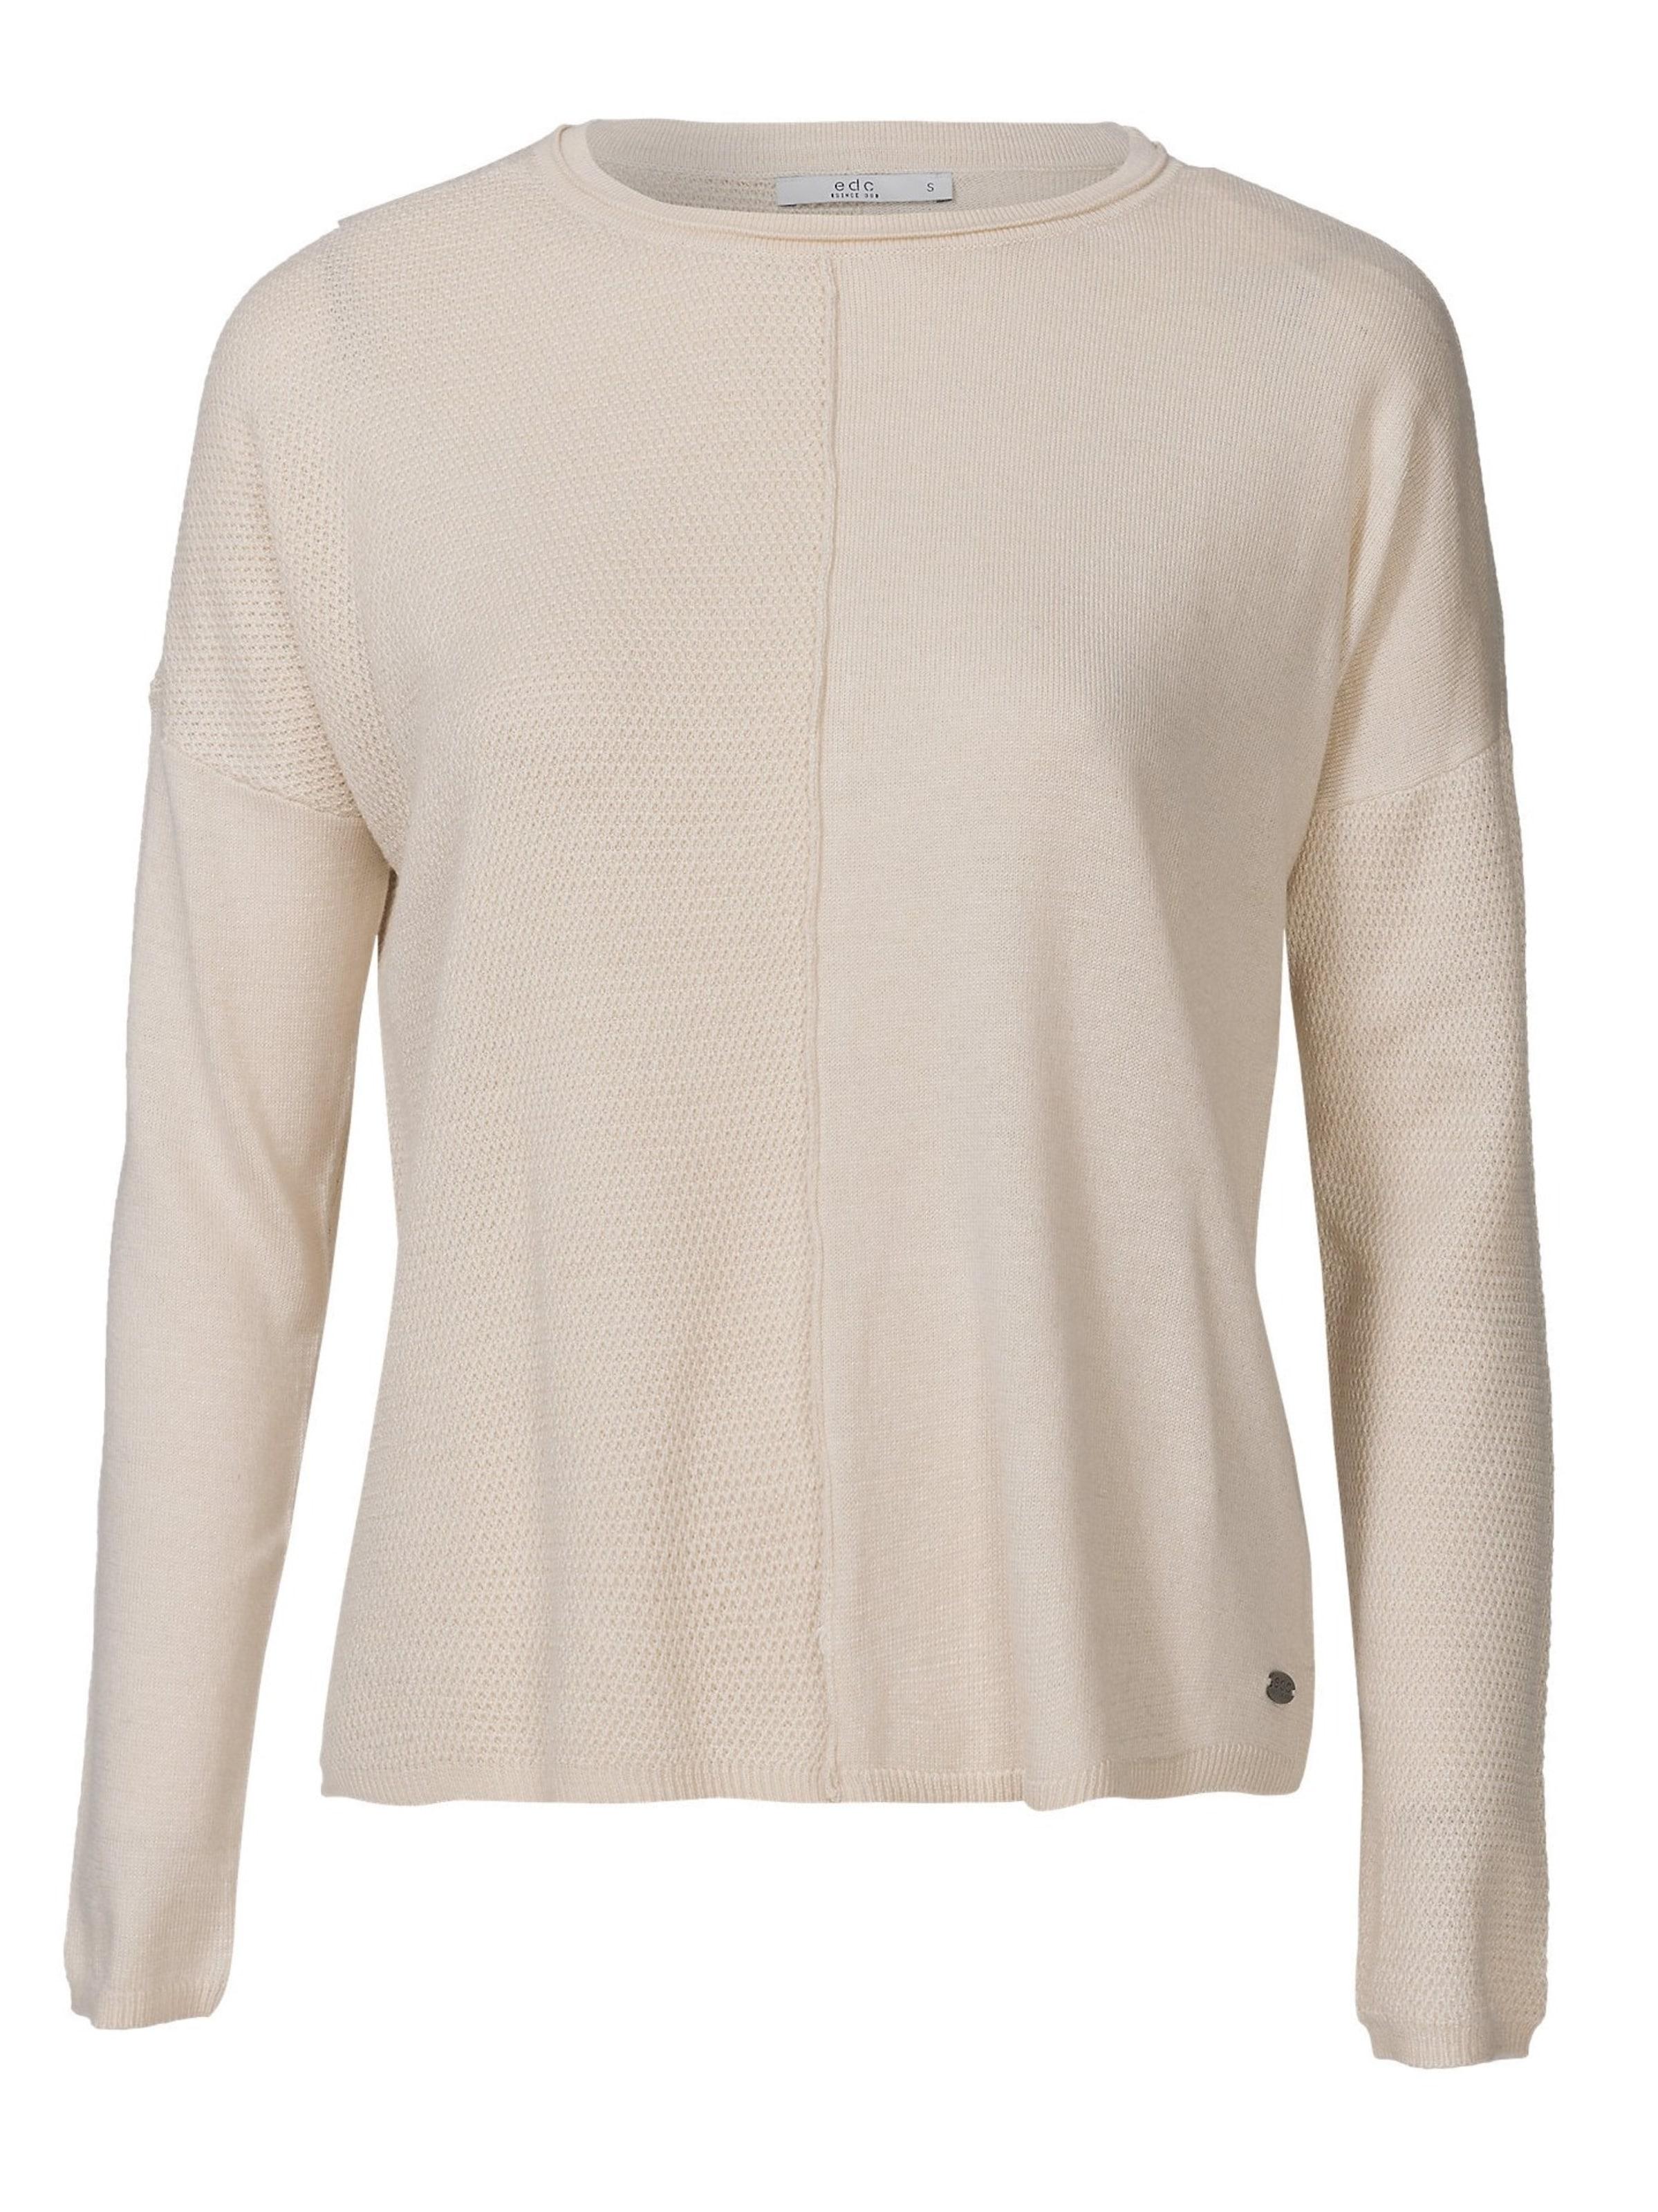 Esprit Edc Pullover In By Creme FJl1cK